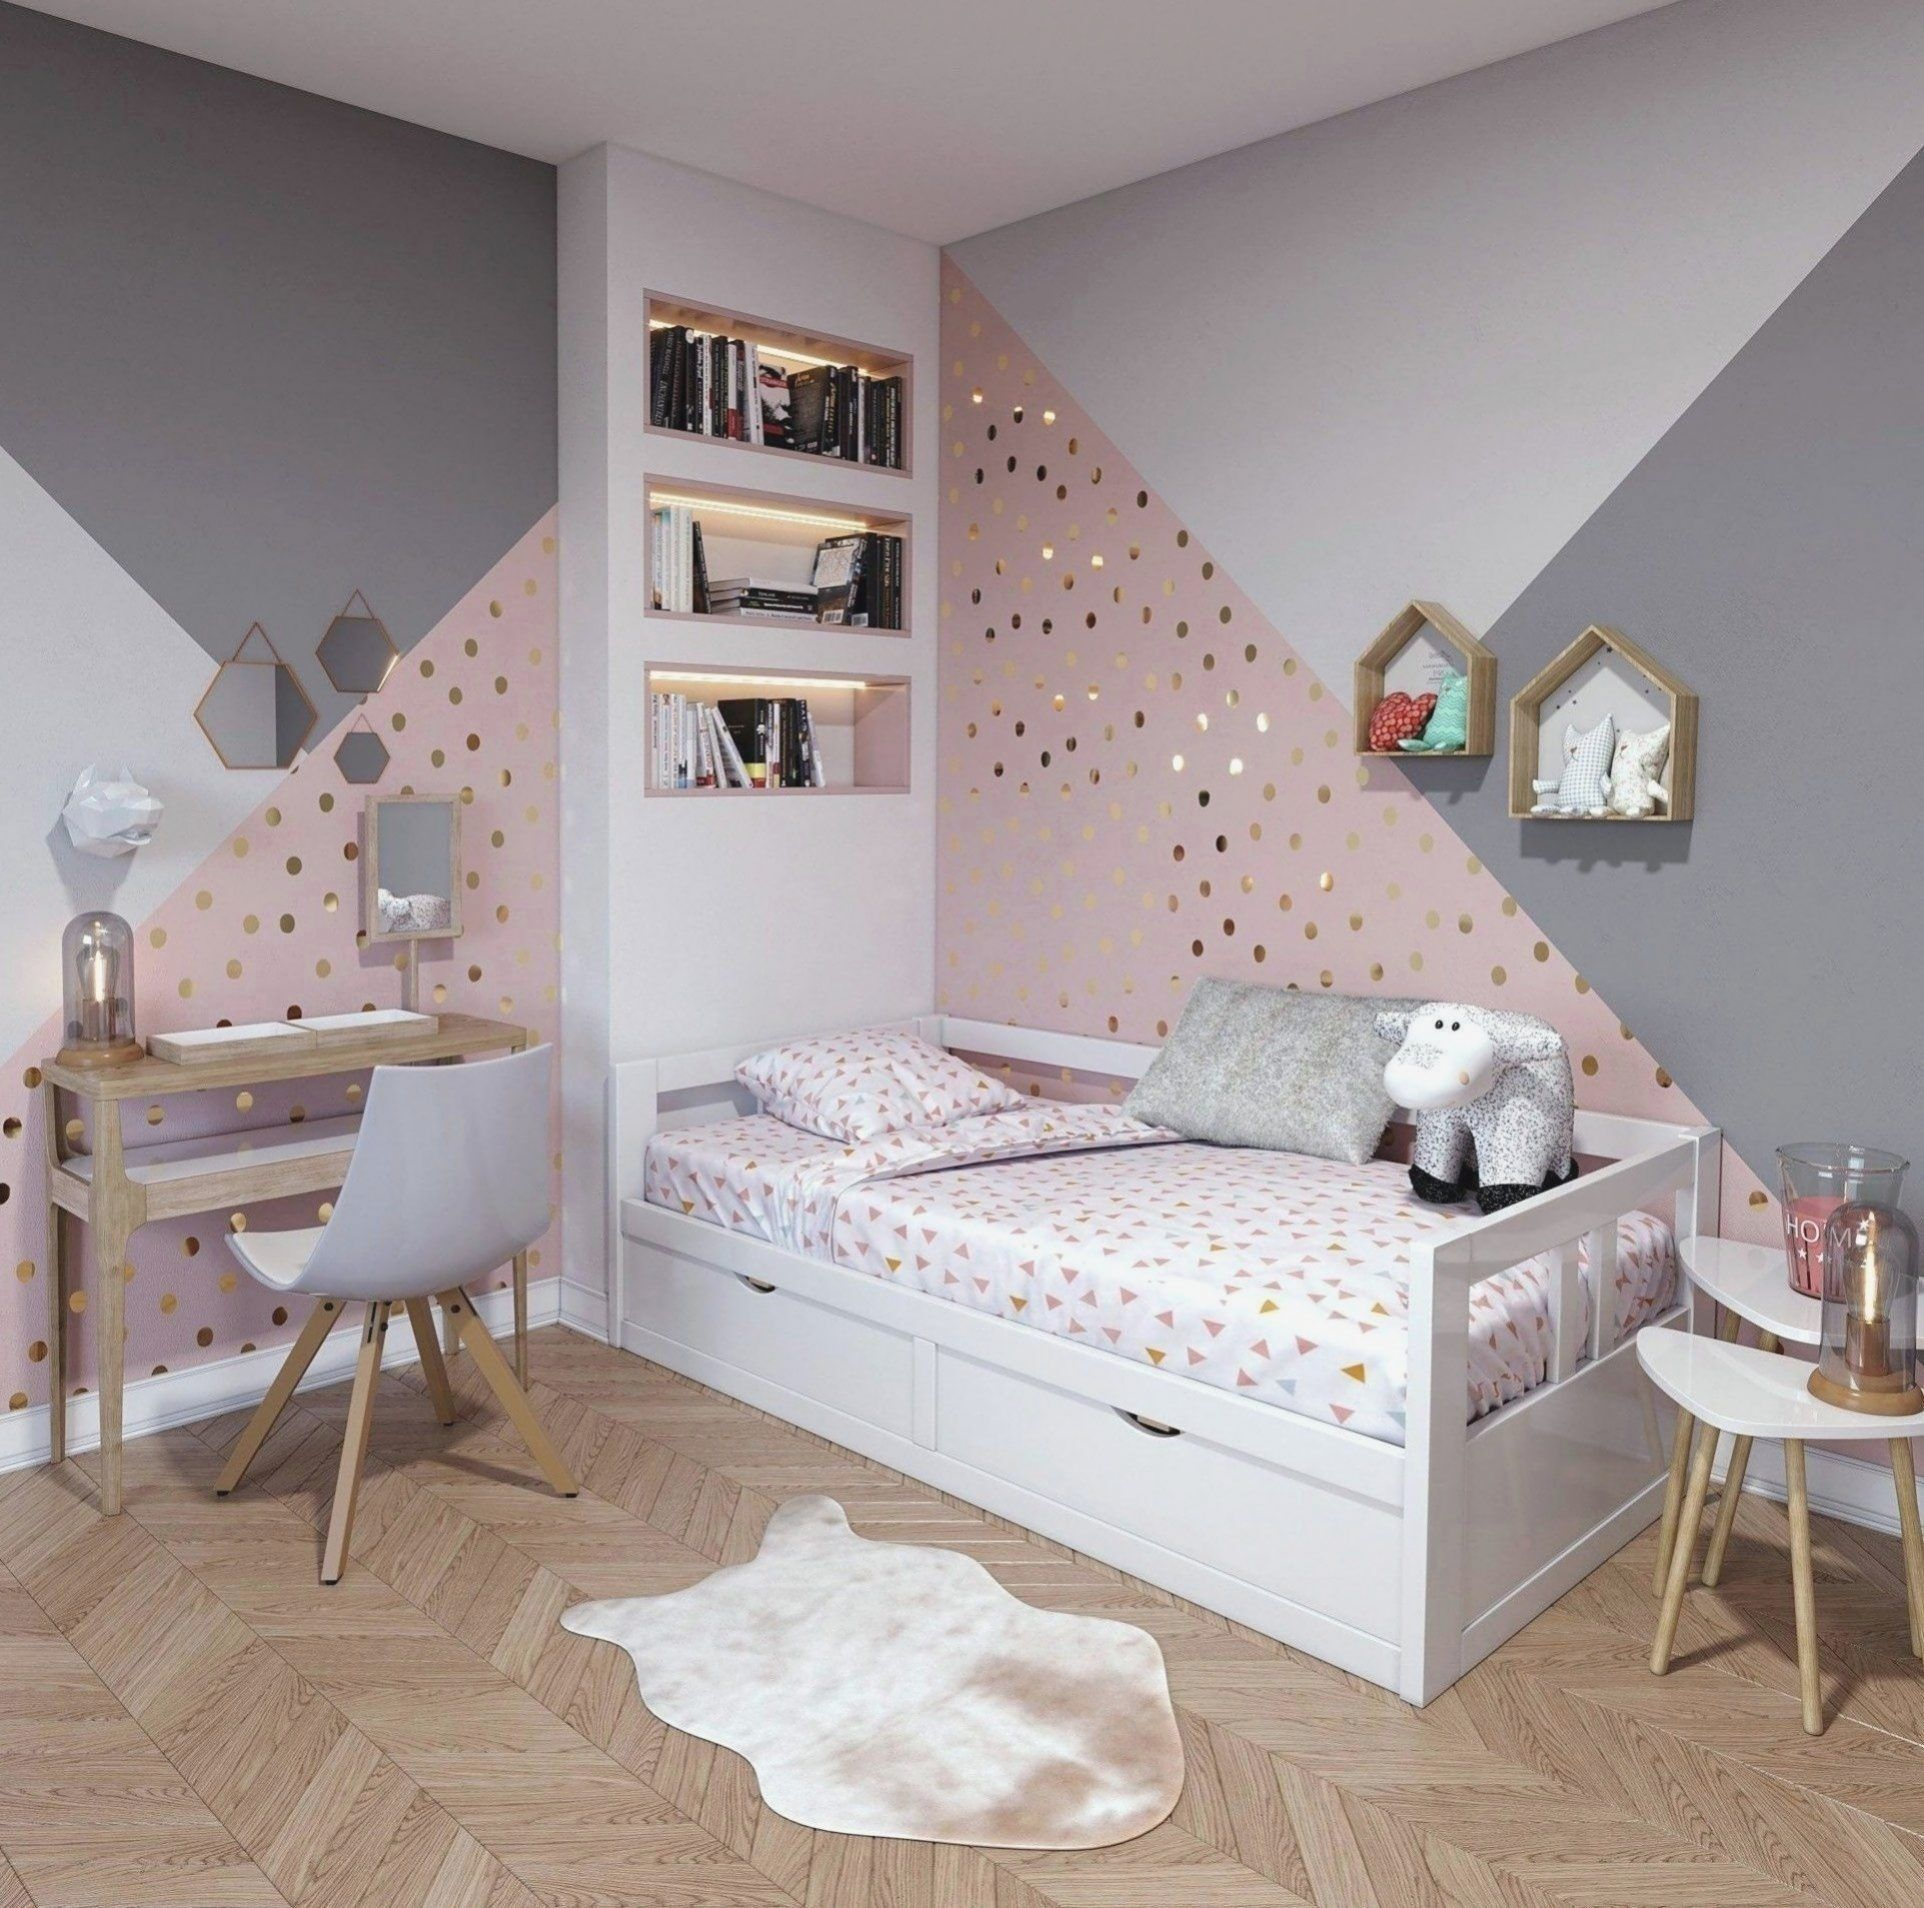 Deco chambre ado fille tonne blanc deco chambre ado fille tonne ...